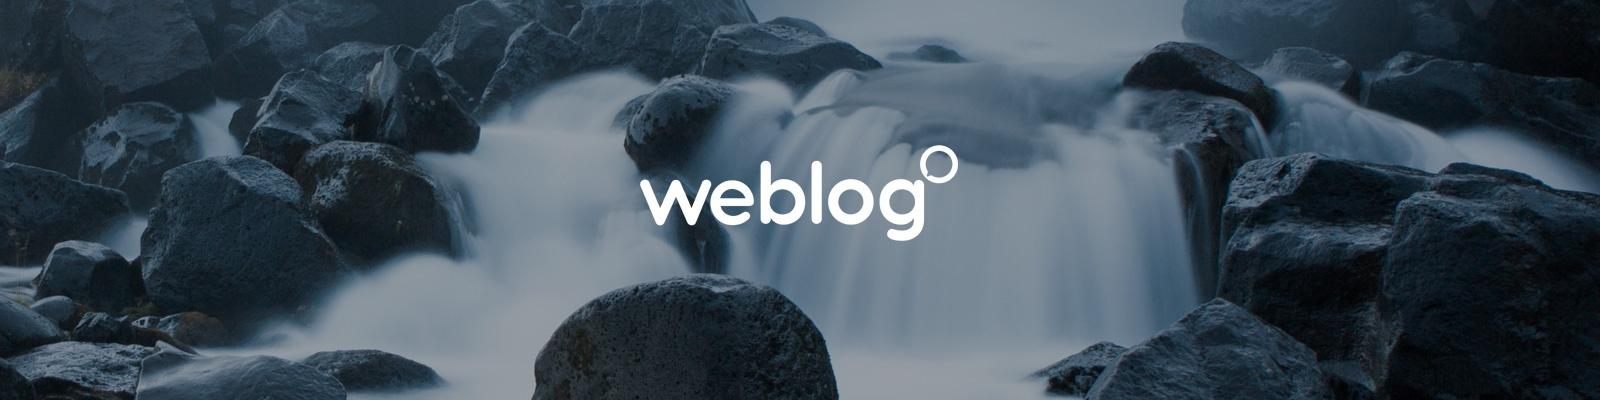 weblog_slide